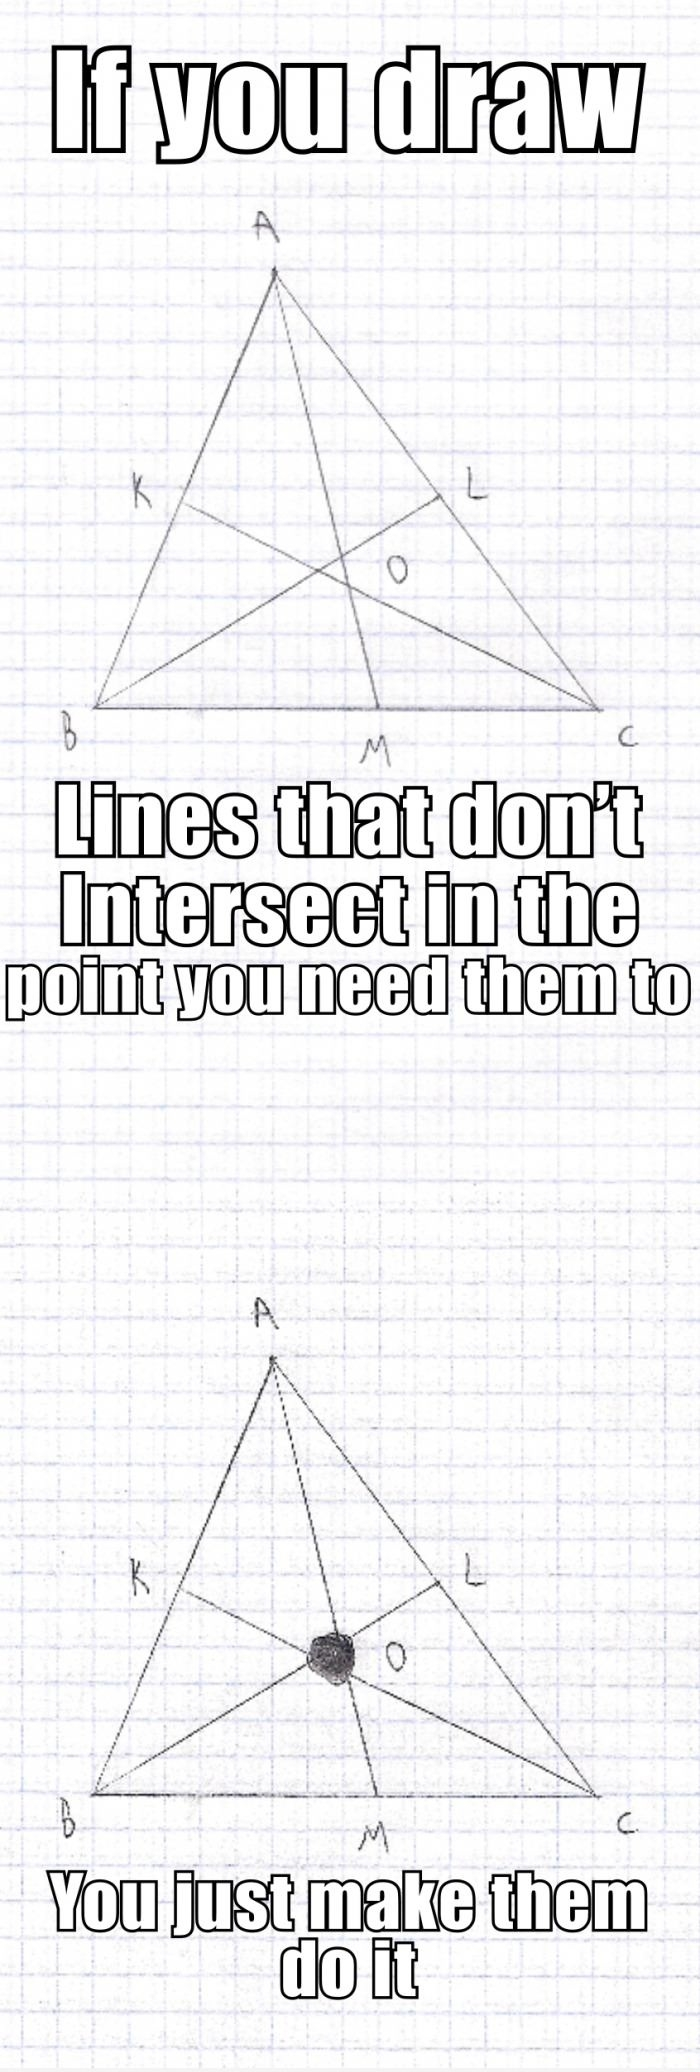 Geometry, is it just me?